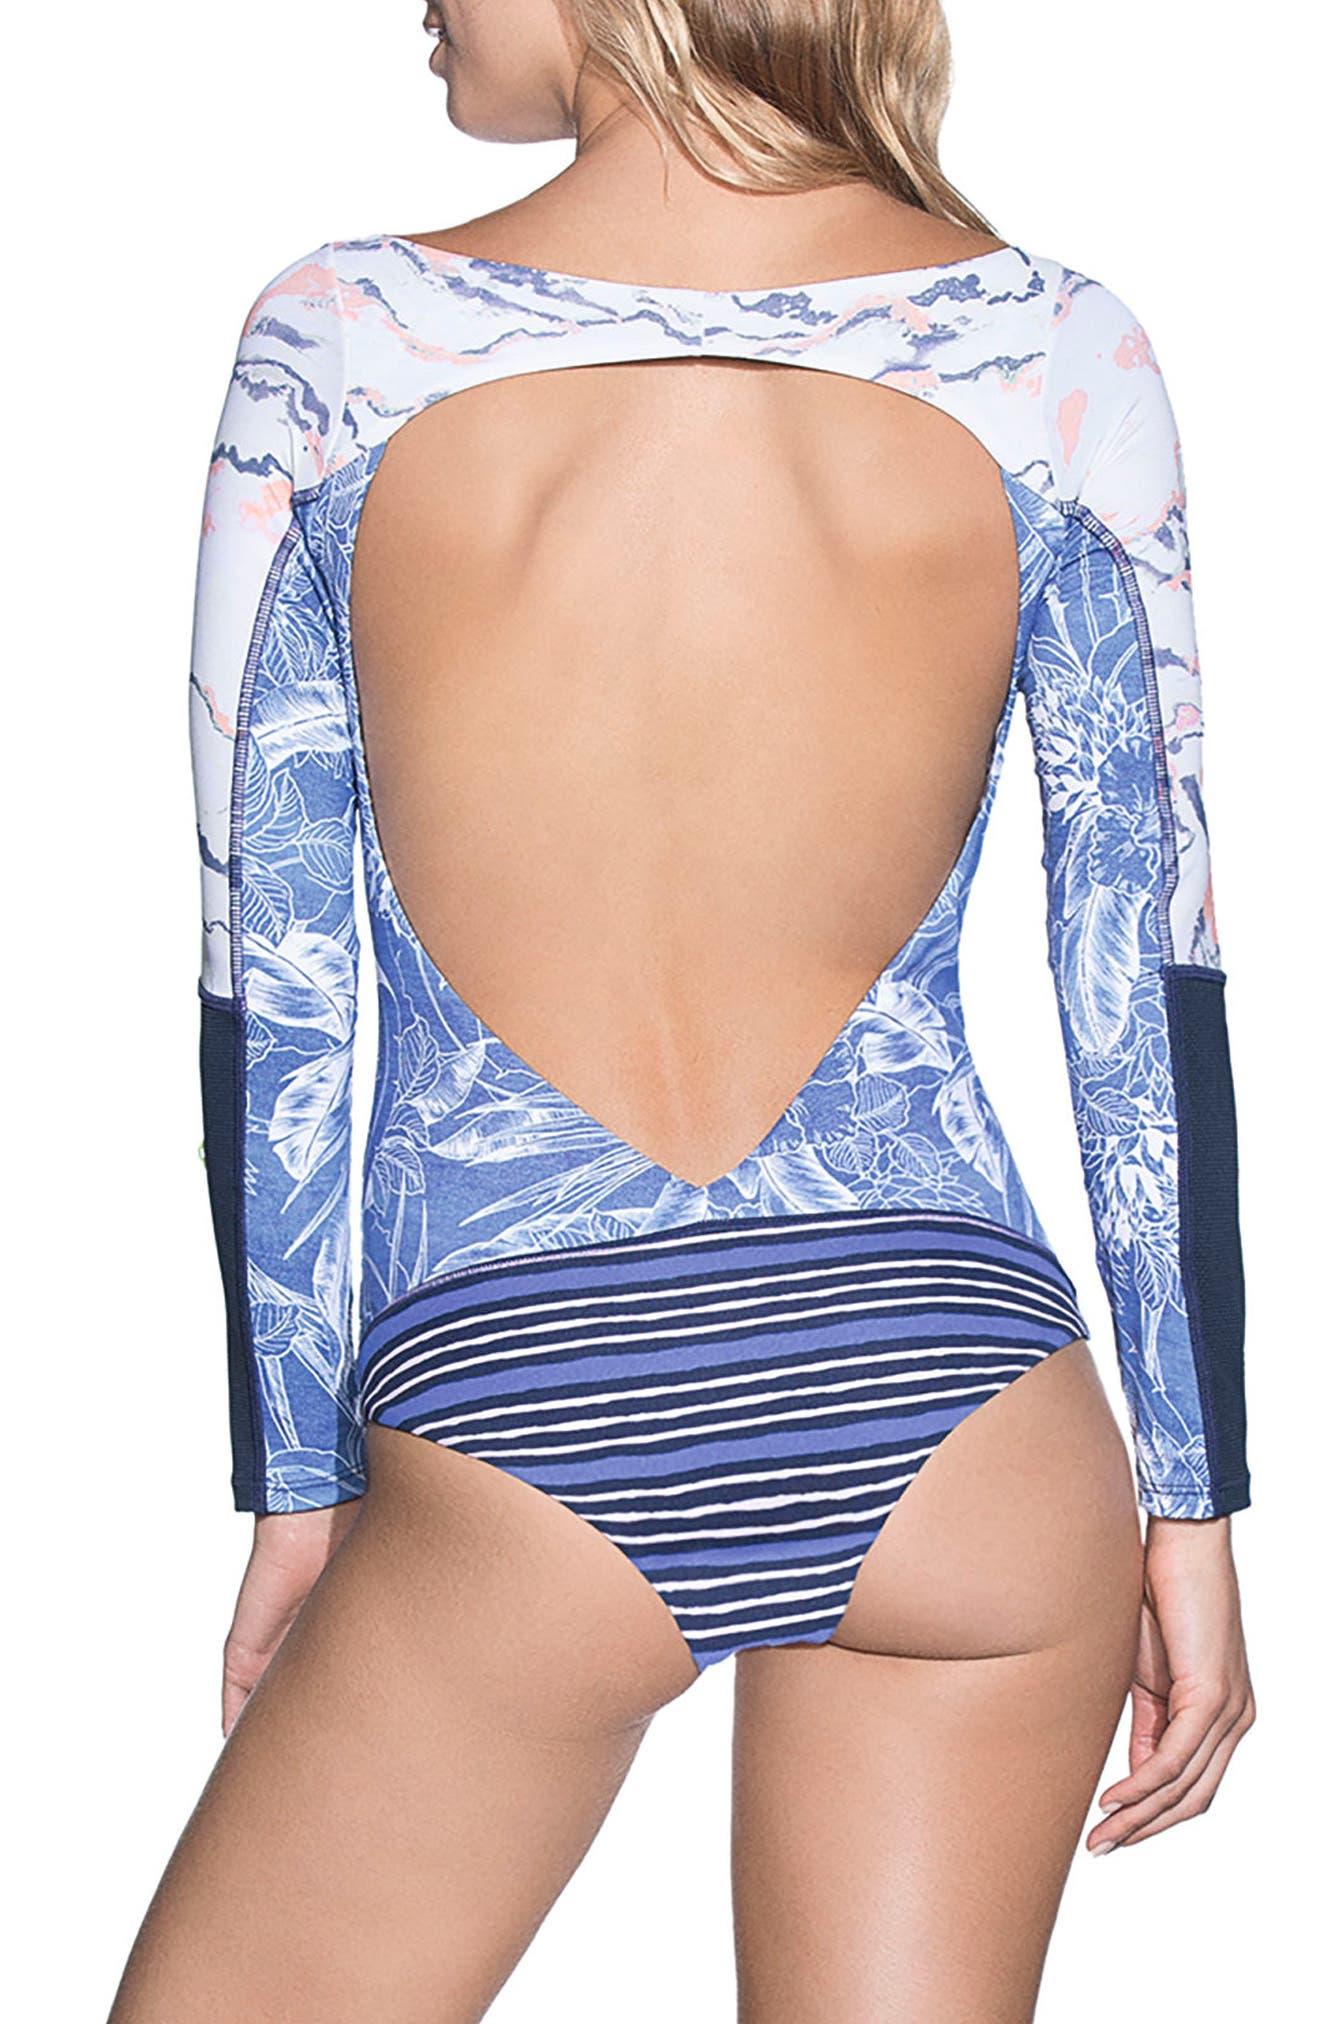 Solano Bay Reversible Rashguard One-Piece Swimsuit,                             Alternate thumbnail 2, color,                             400